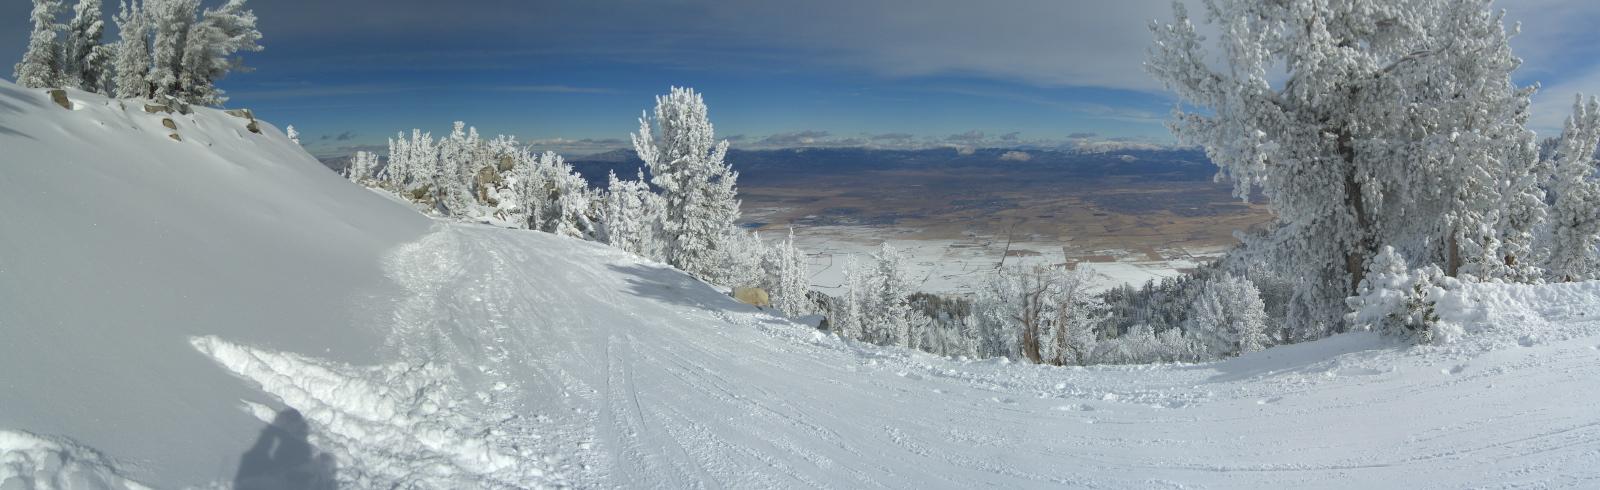 Nevada from Heavenly Panorama 2